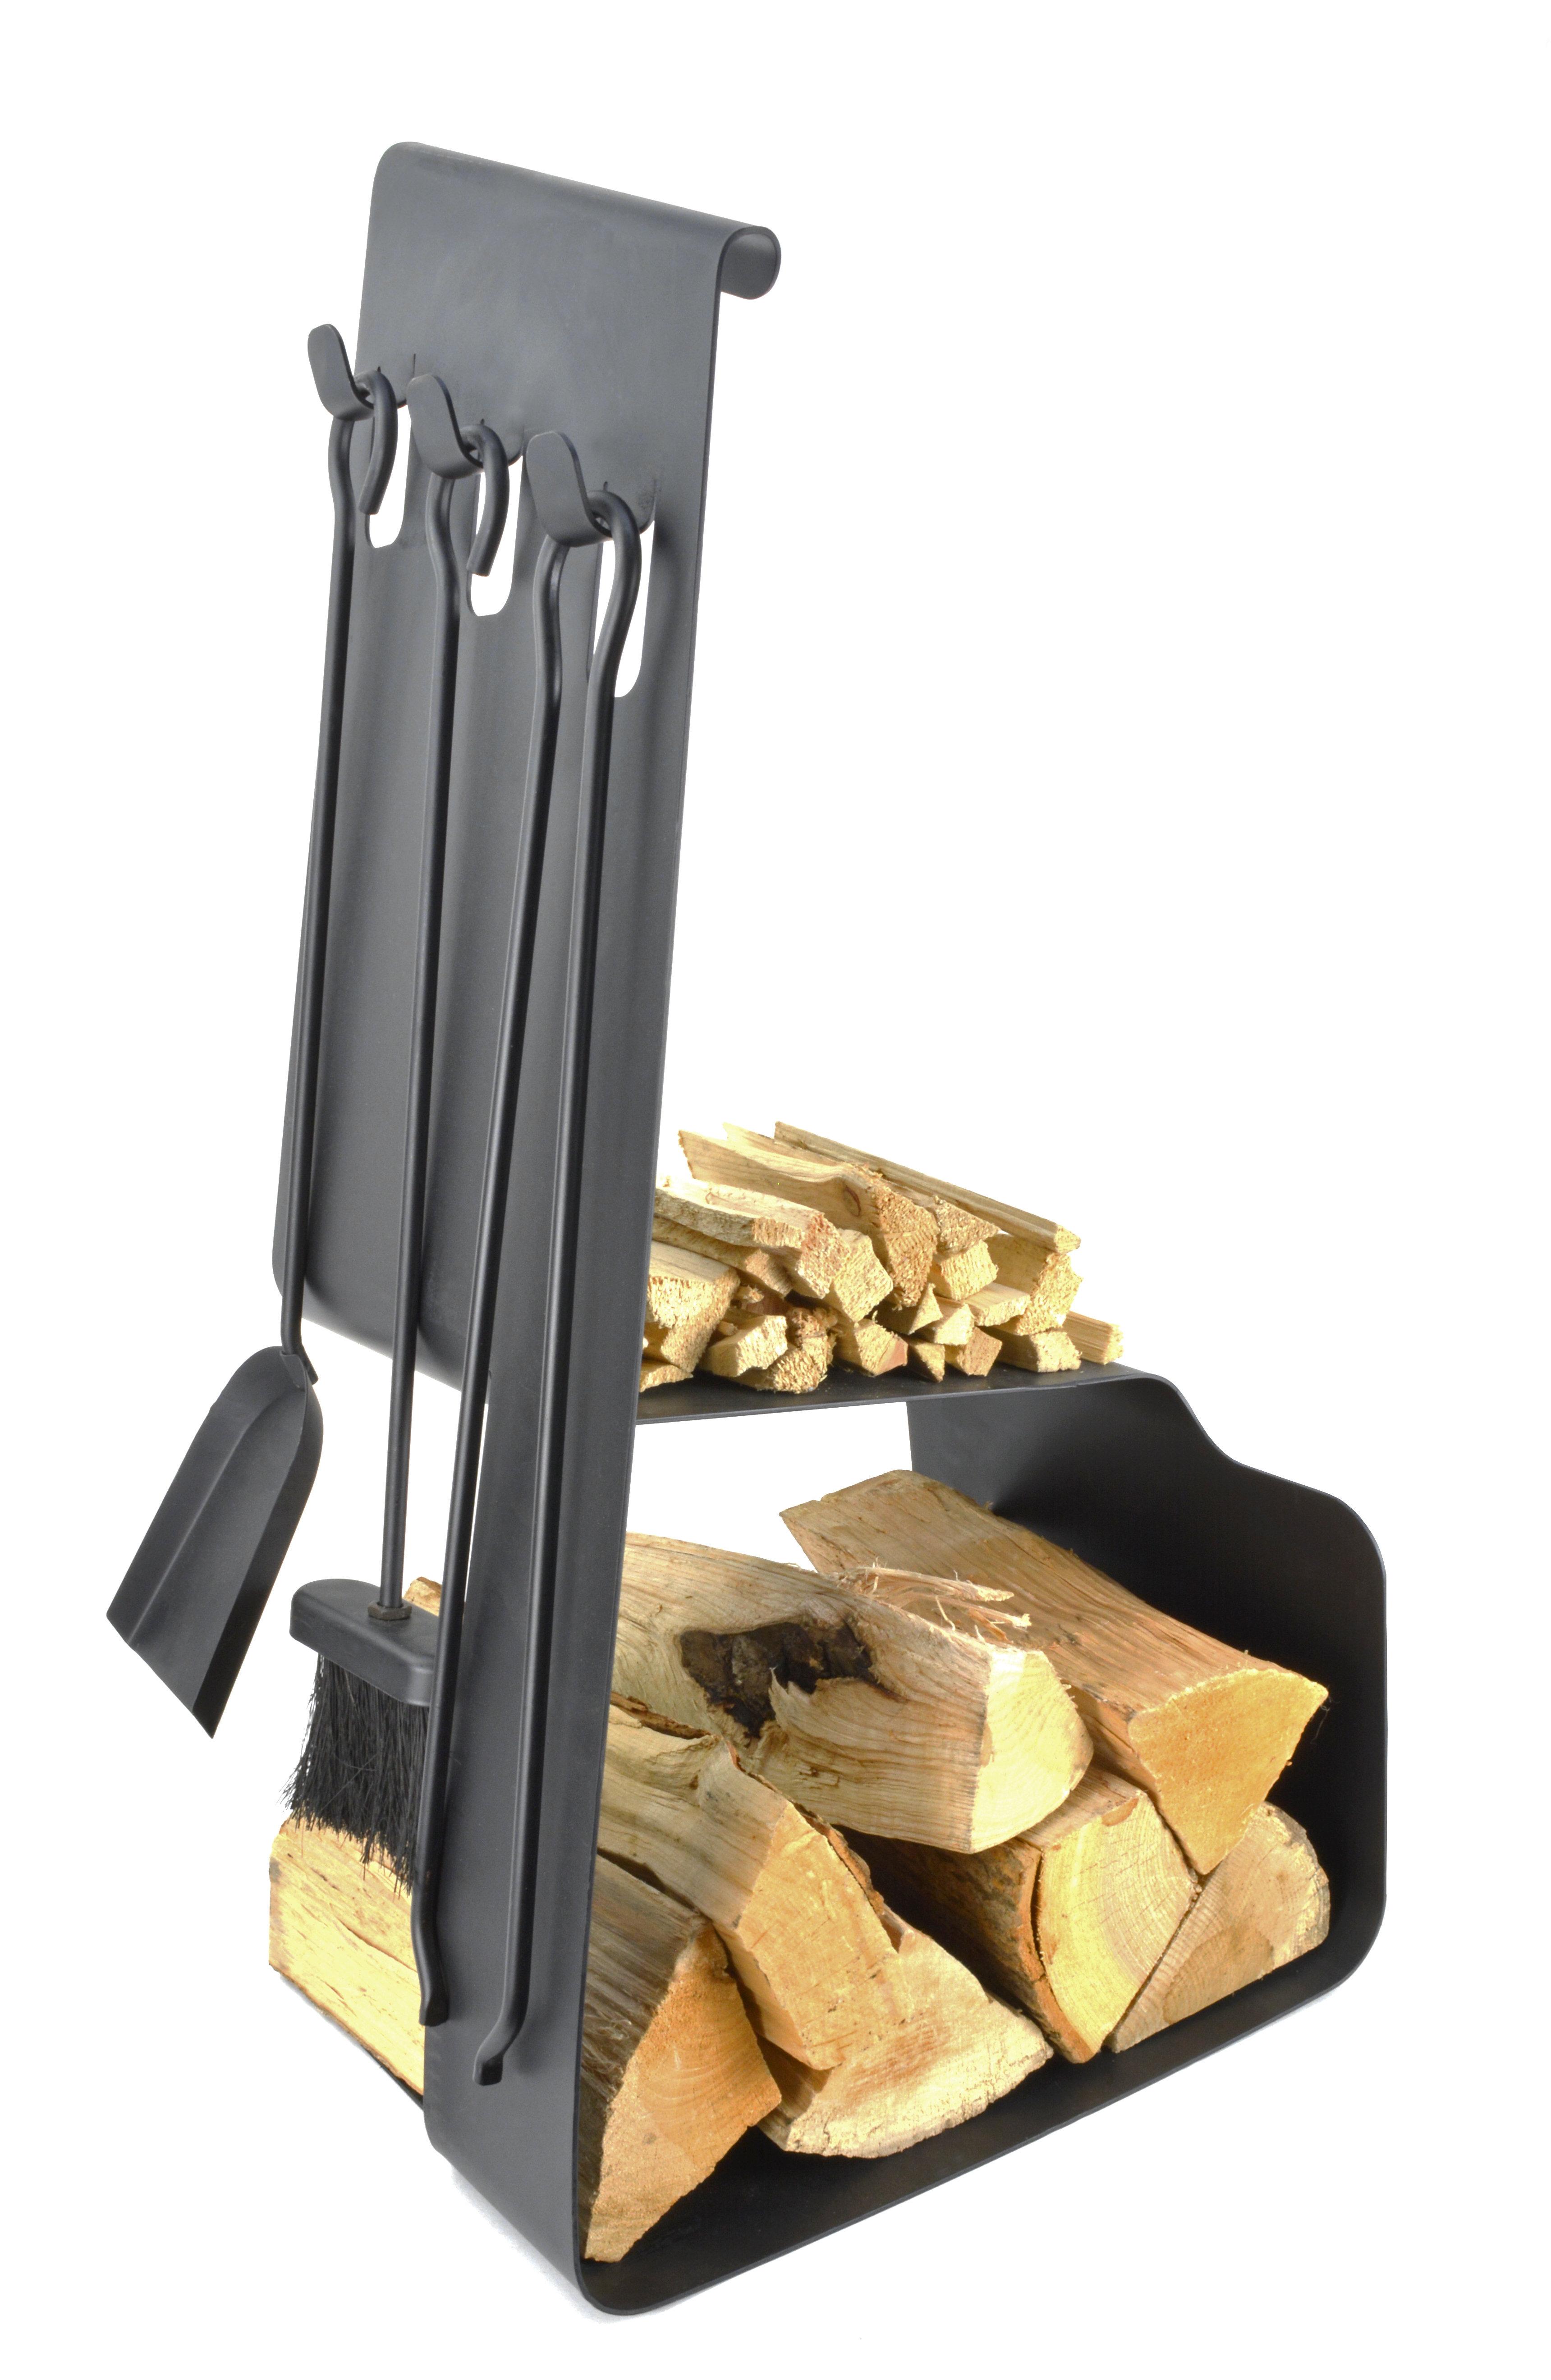 Clearambient Holzkorb Viking Mit Kaminbesteck Aus Stahl Wayfair De